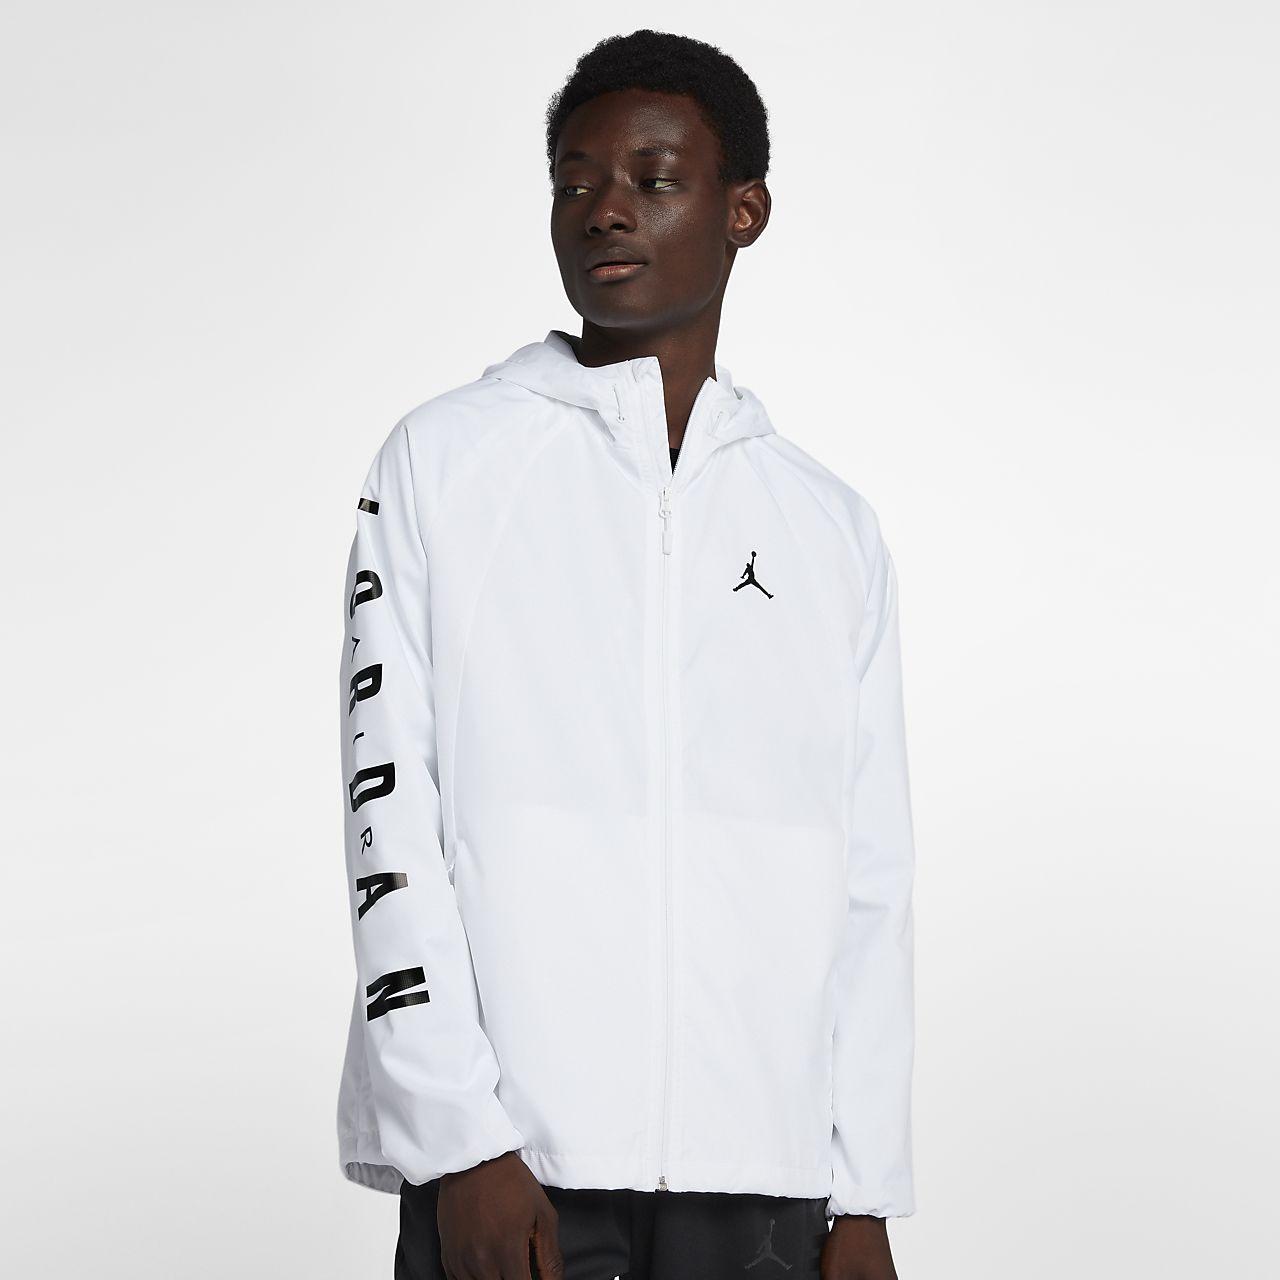 9edfb3d4950a Jordan Lifestyle Wings Windbreaker Men s Jacket. Nike.com SK